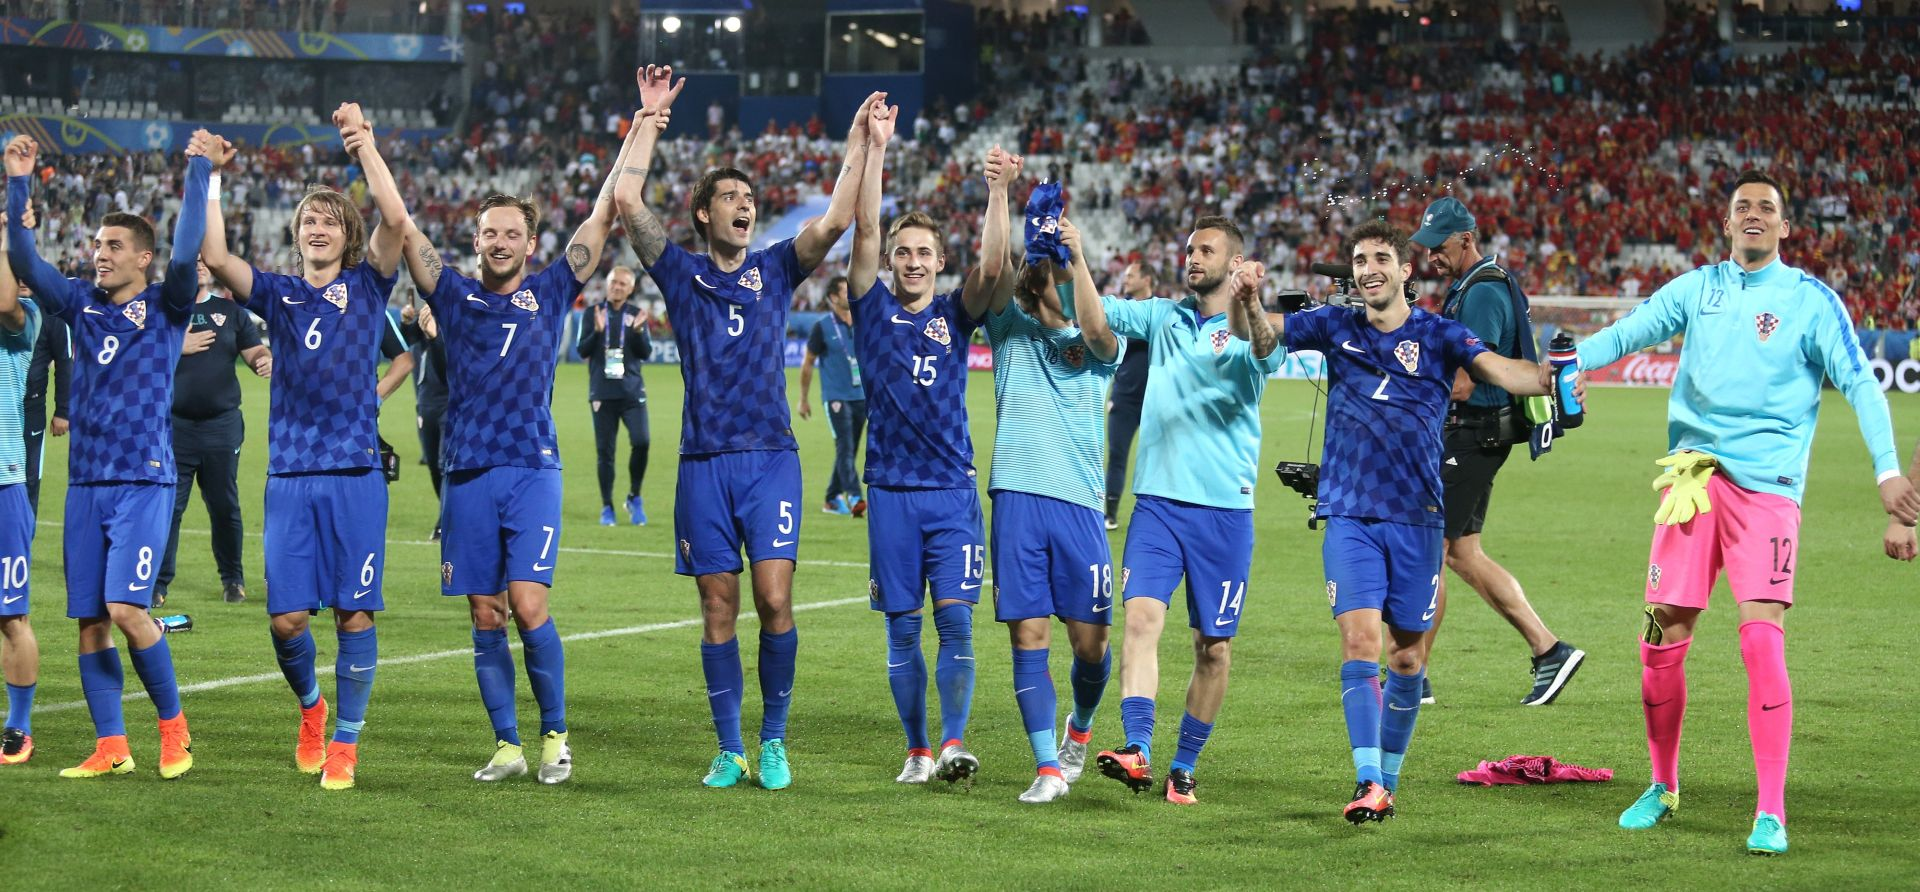 HRVATSKA NA WEMBLEYJU Allardyce debitira na engleskoj klupi protiv 'Vatrenih' 1. rujna